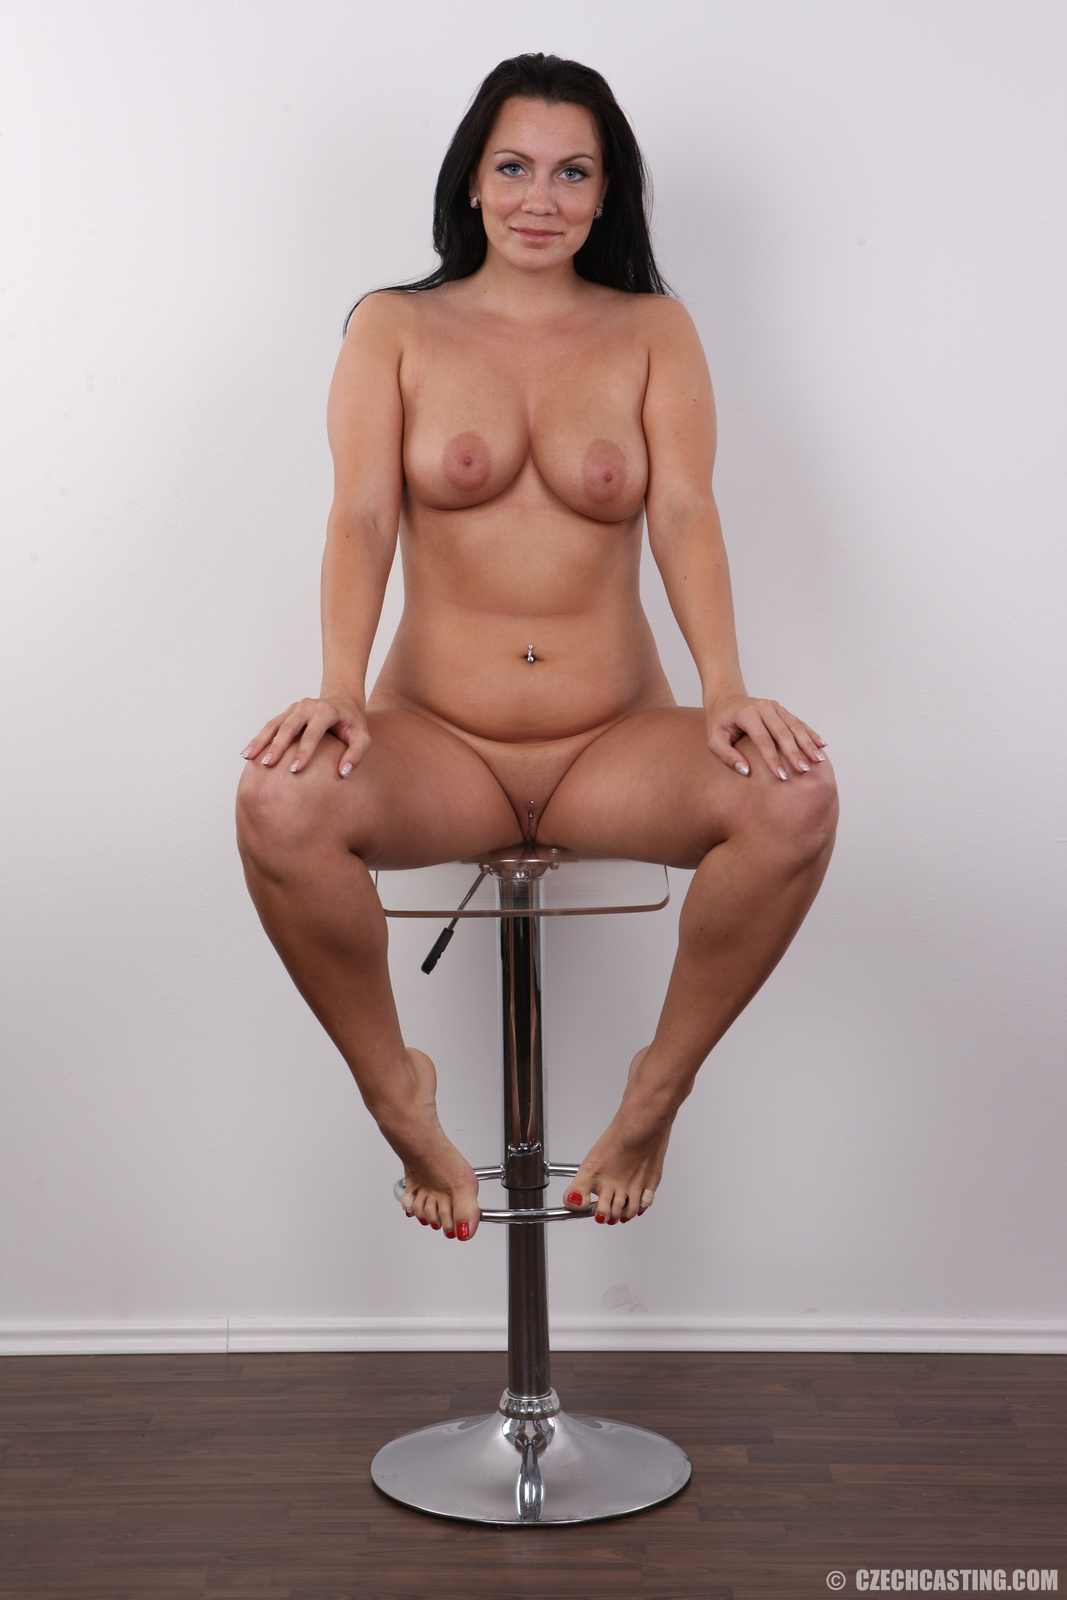 afghan fat woman hot sex